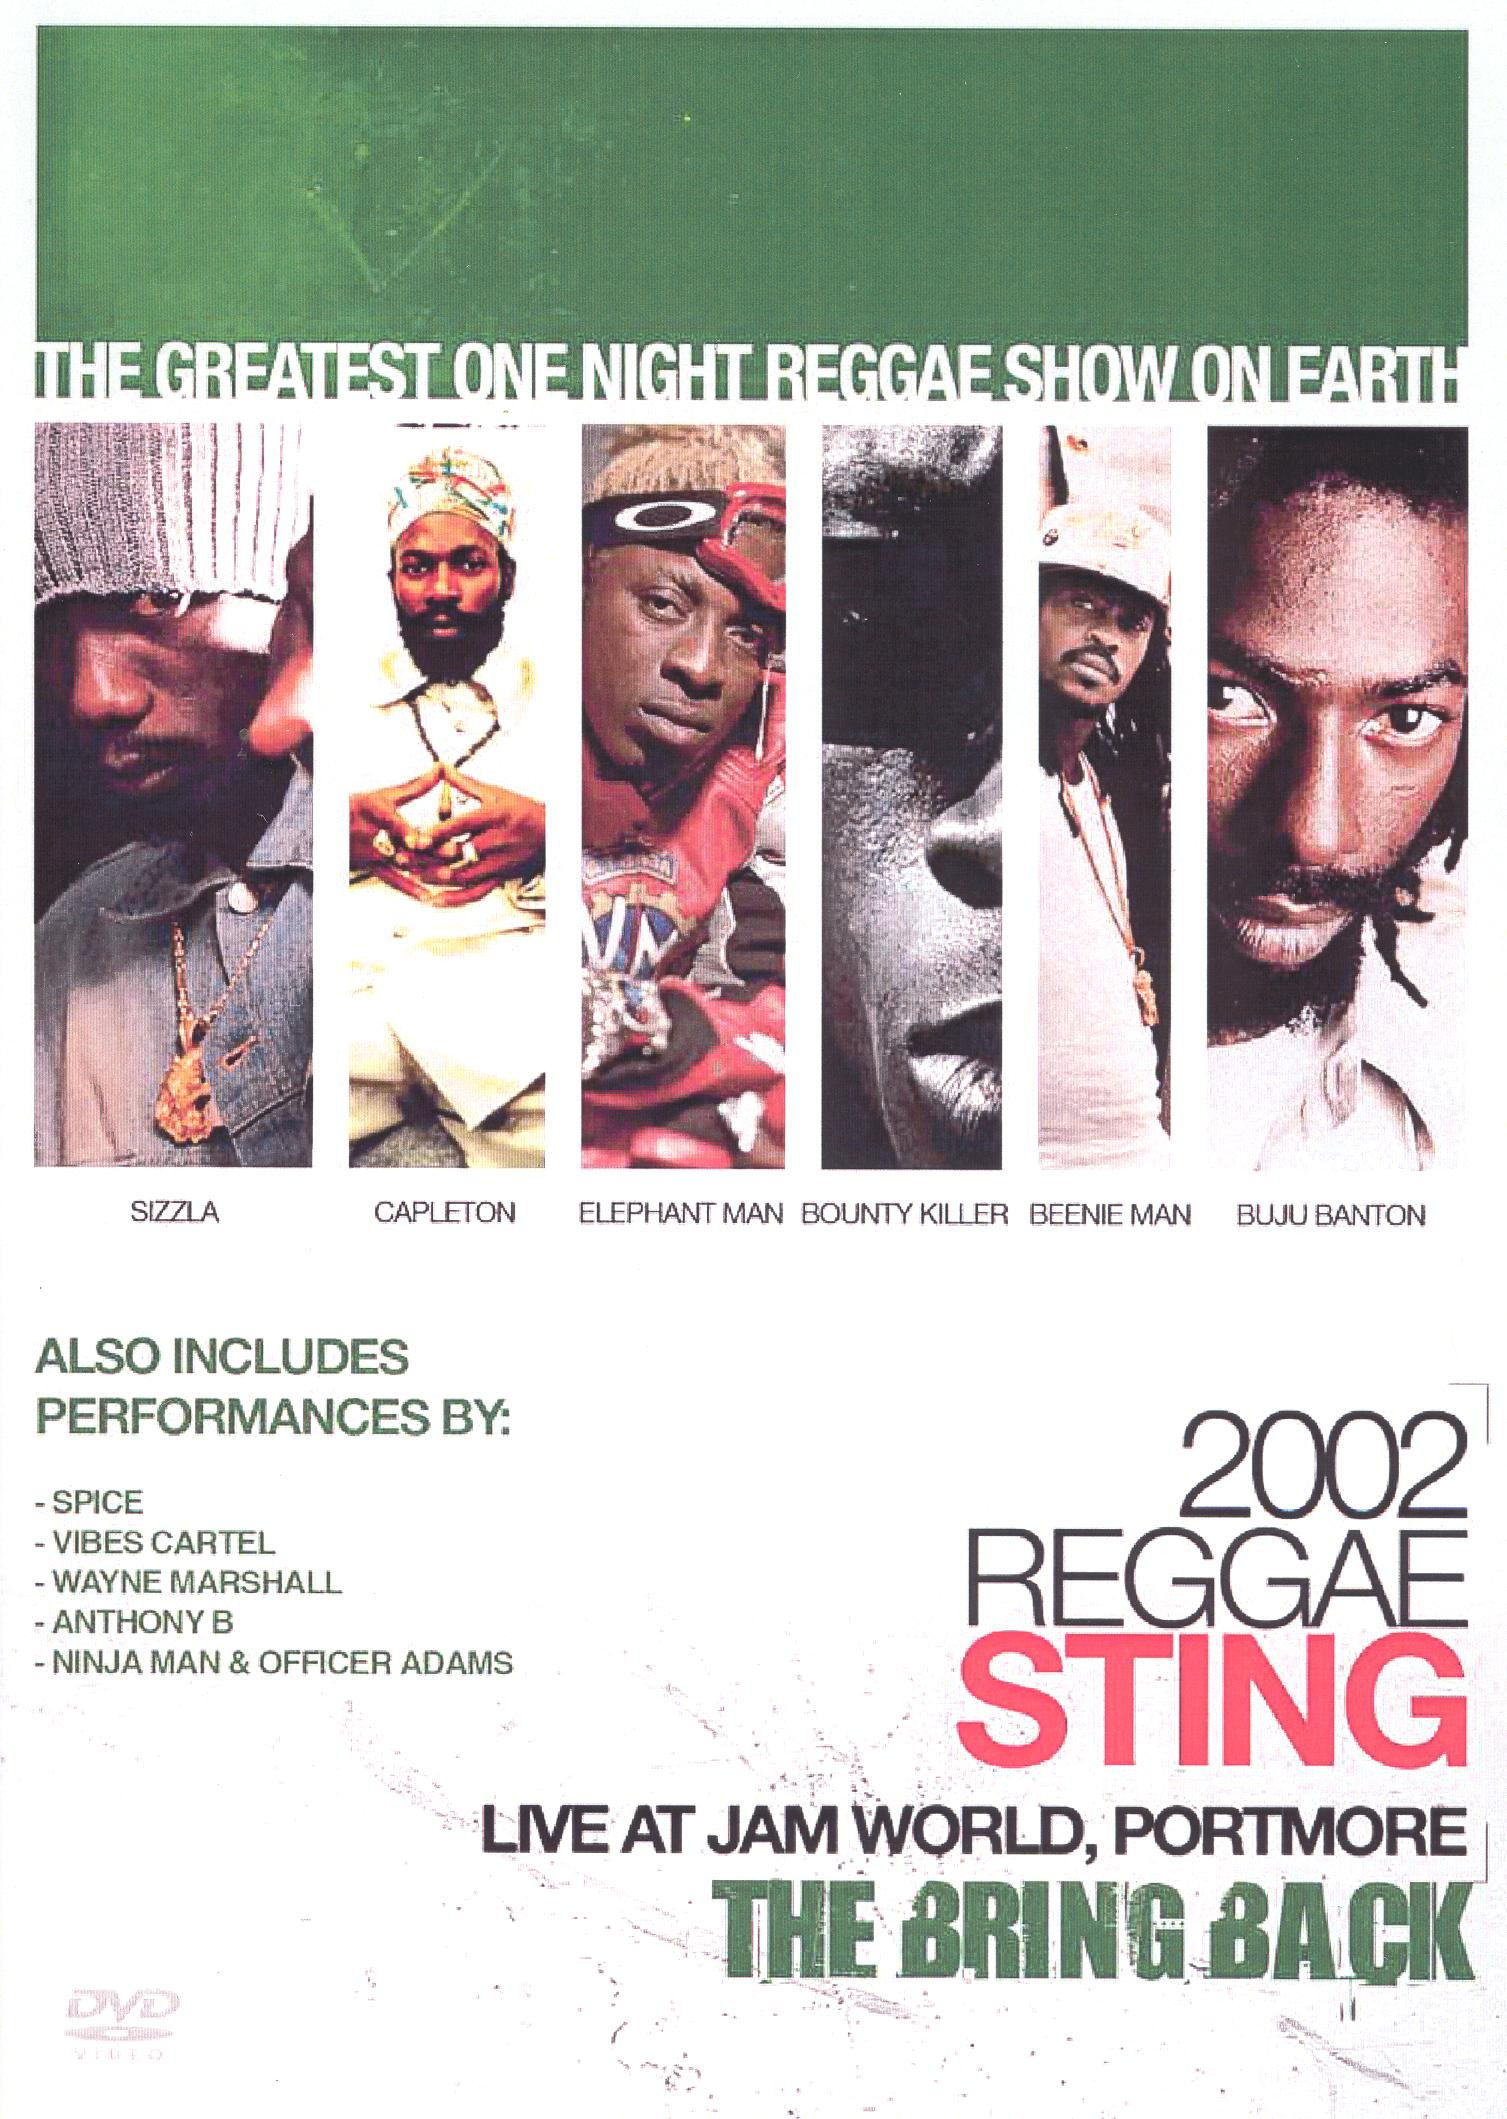 Reggae Sting 2002: The Bring Back